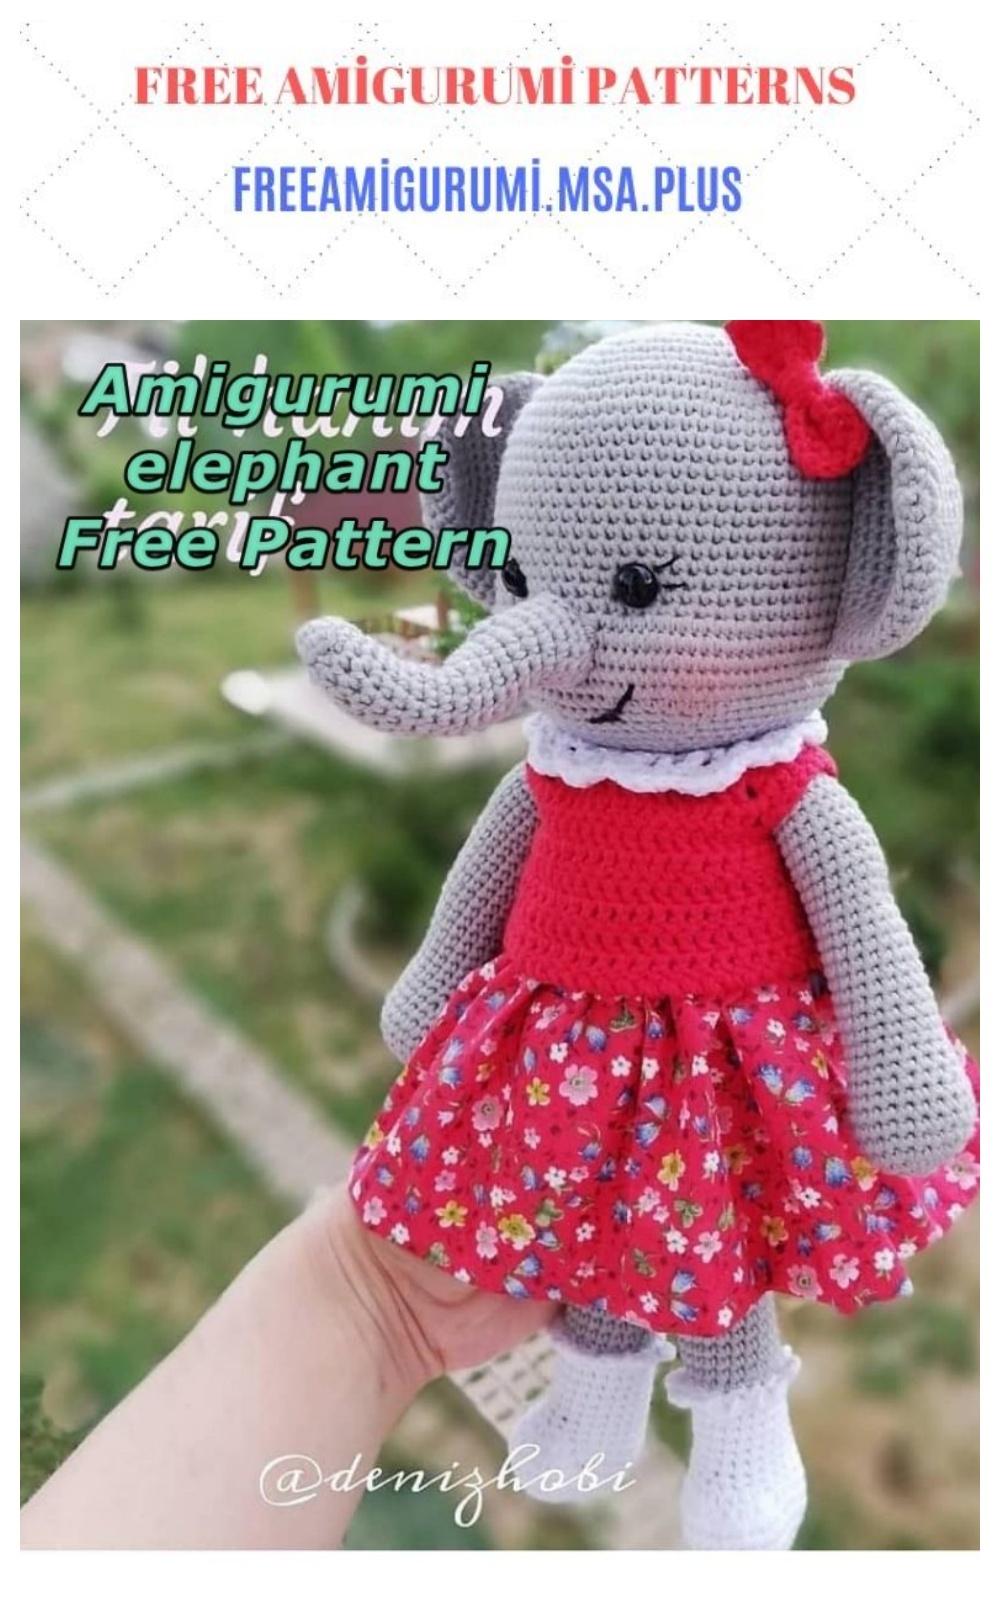 Amigurumi Female Elephant Free Crochet Pattern - Crochet.msa.plus | 1600x1000